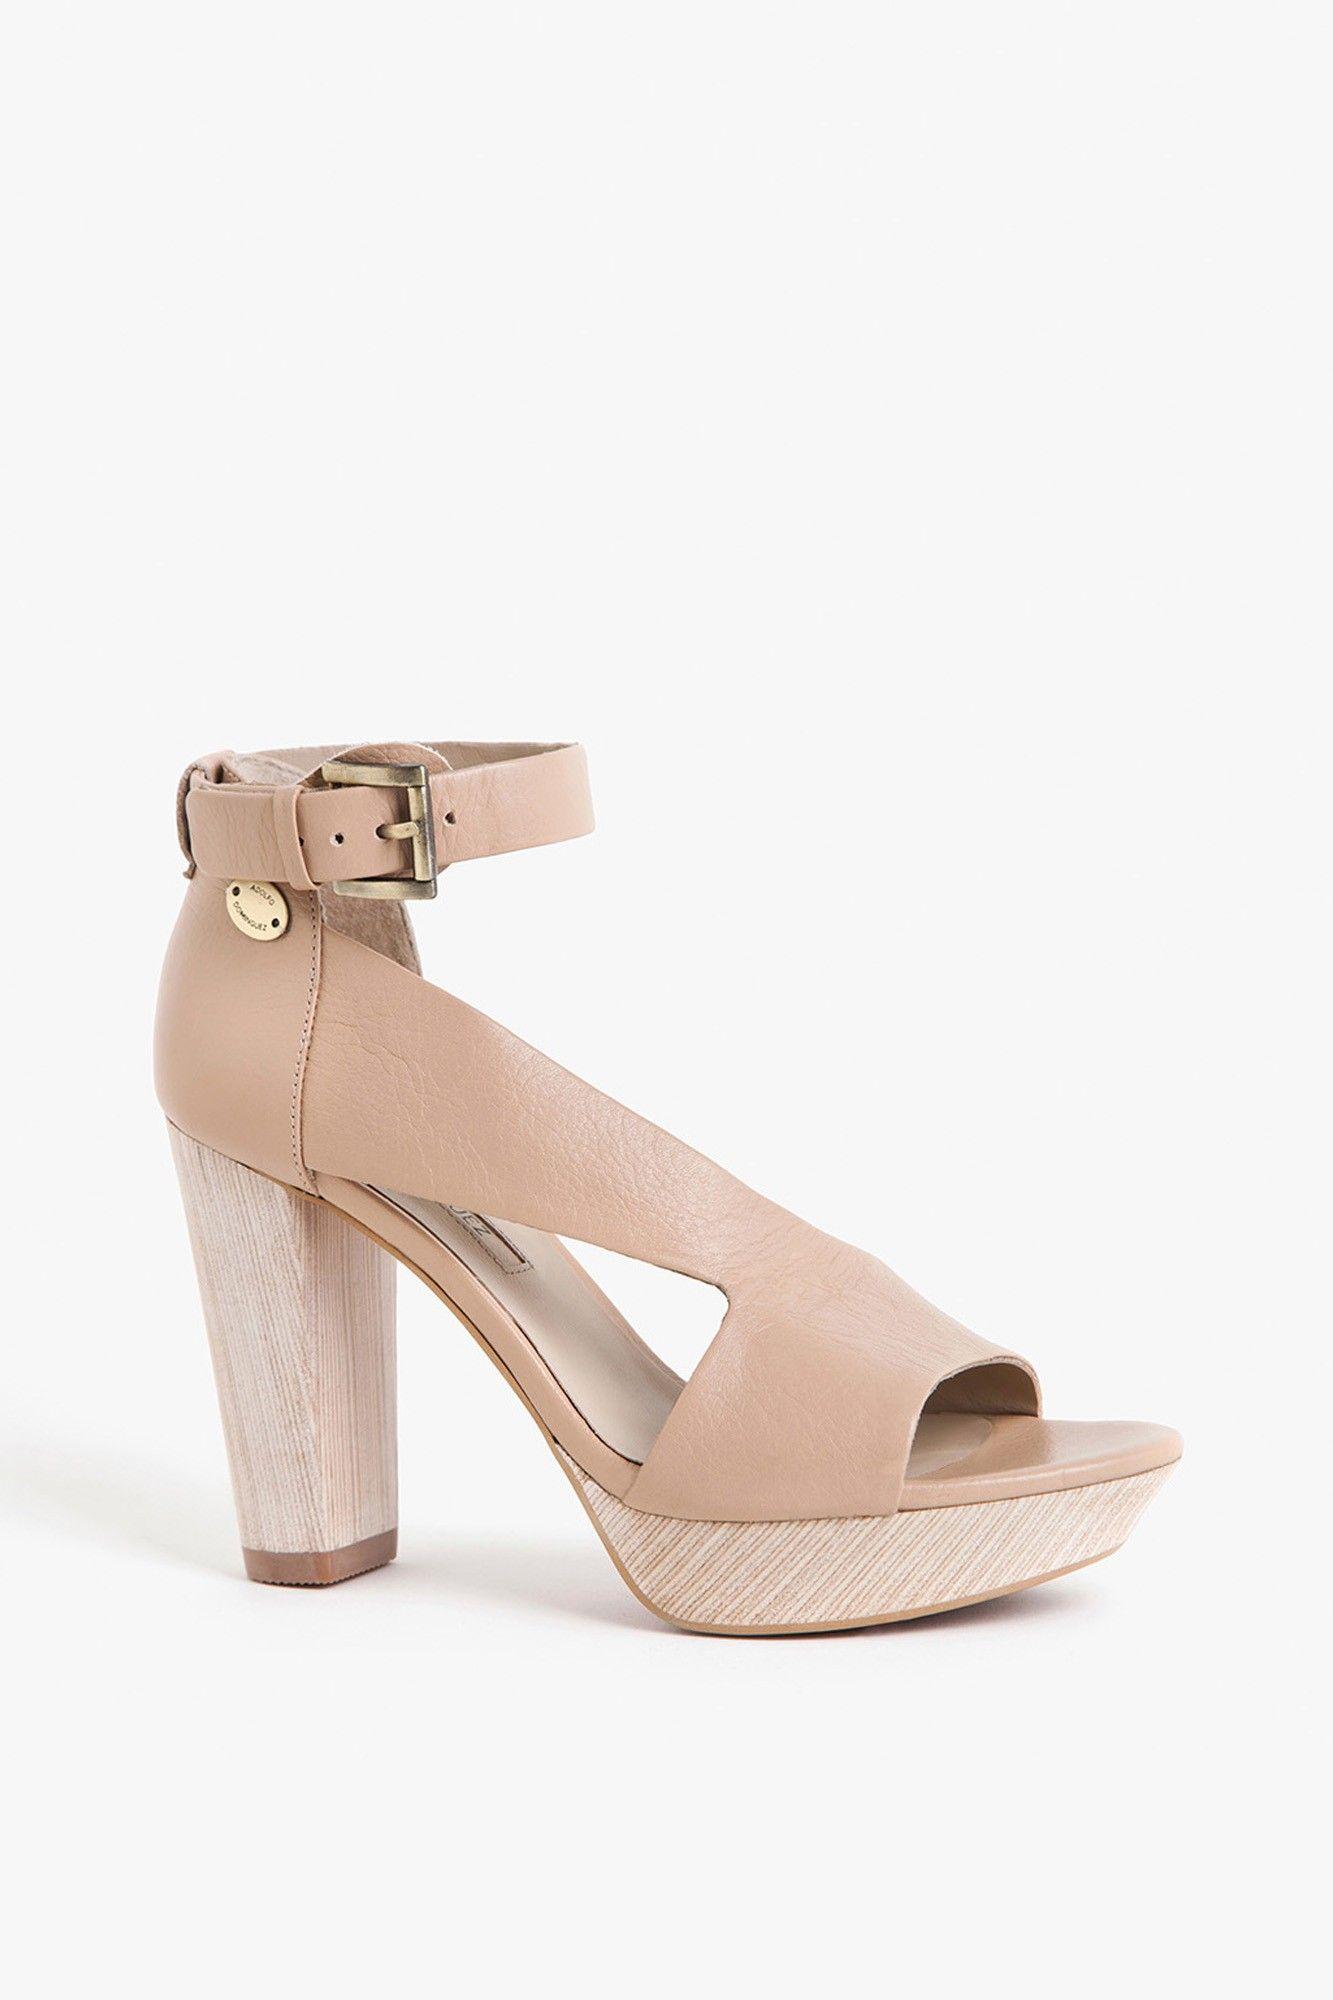 Sandalia de piel graneada | Adolfo Dominguez